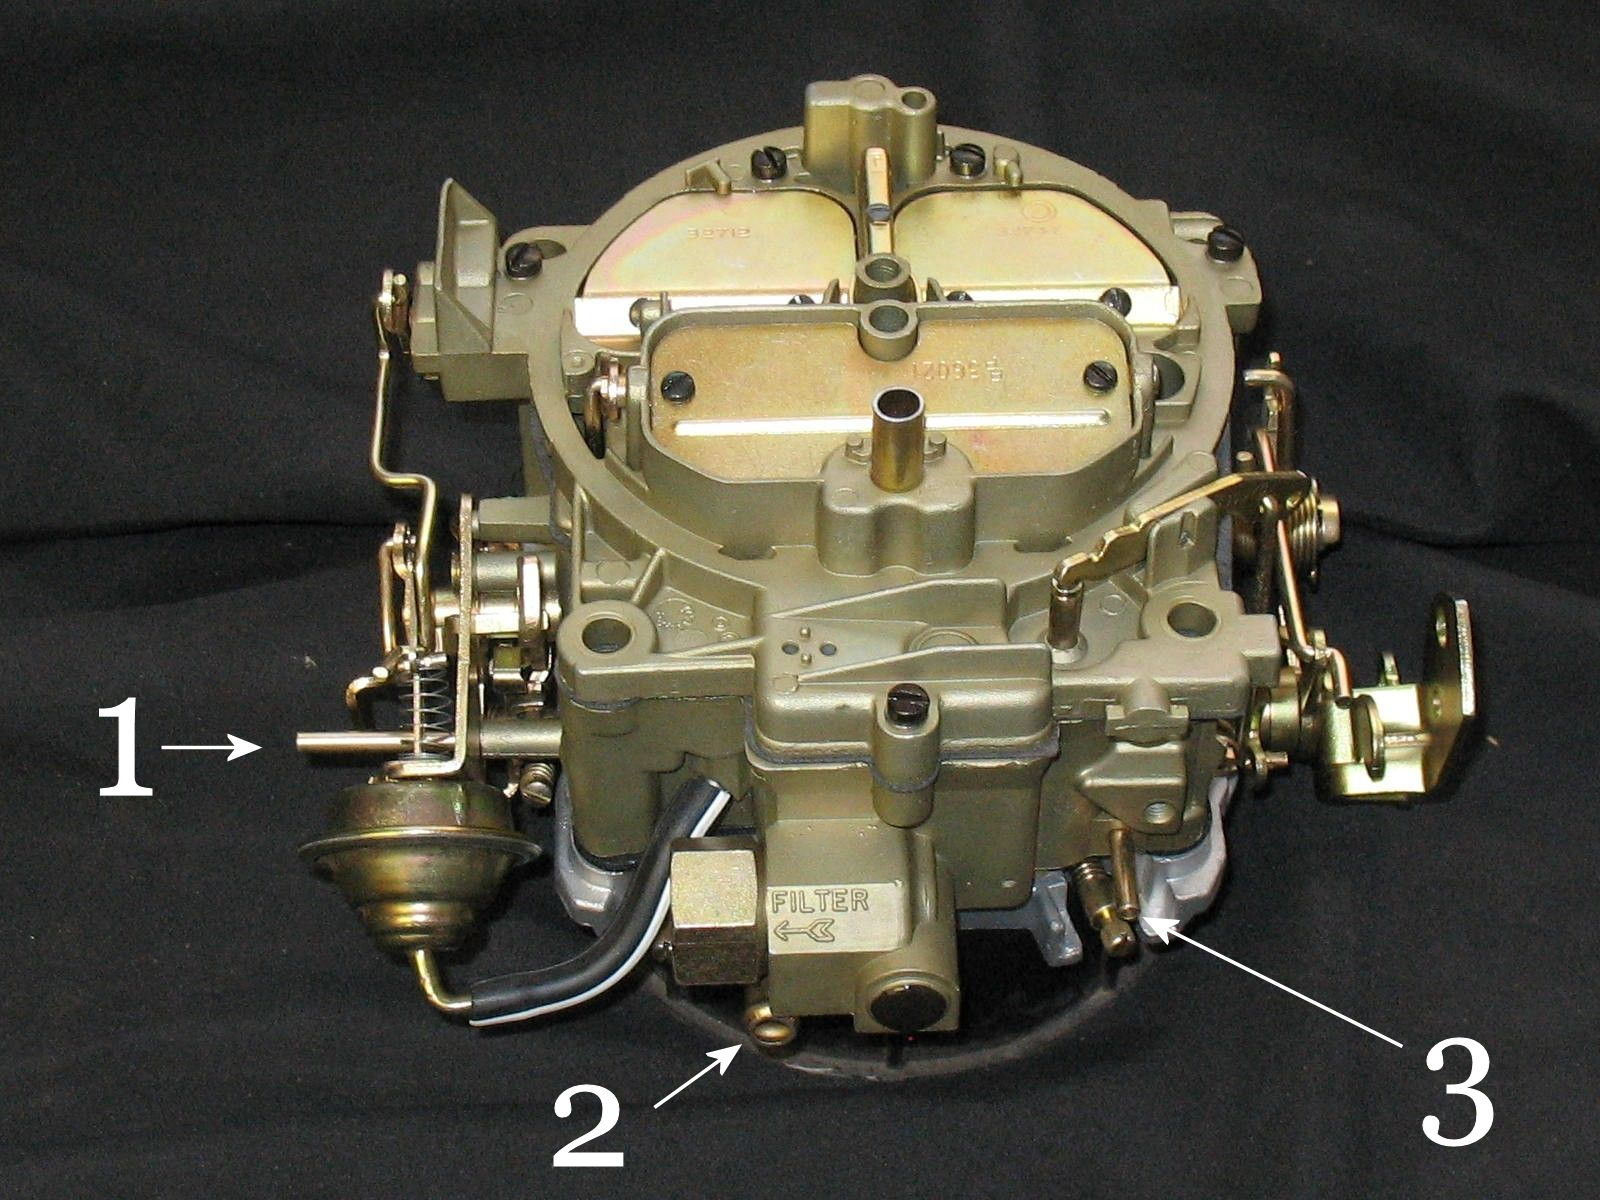 1113981 1979 F 150 Wiring Diagram furthermore Watch further Motorcraft 2150 carburetor furthermore 3953228 Ports On Quadrajet 4mv furthermore 1365351 Installing C6 Rebuilt Transmission Crossmember Problems. on 4 barrel carburetor diagram 350